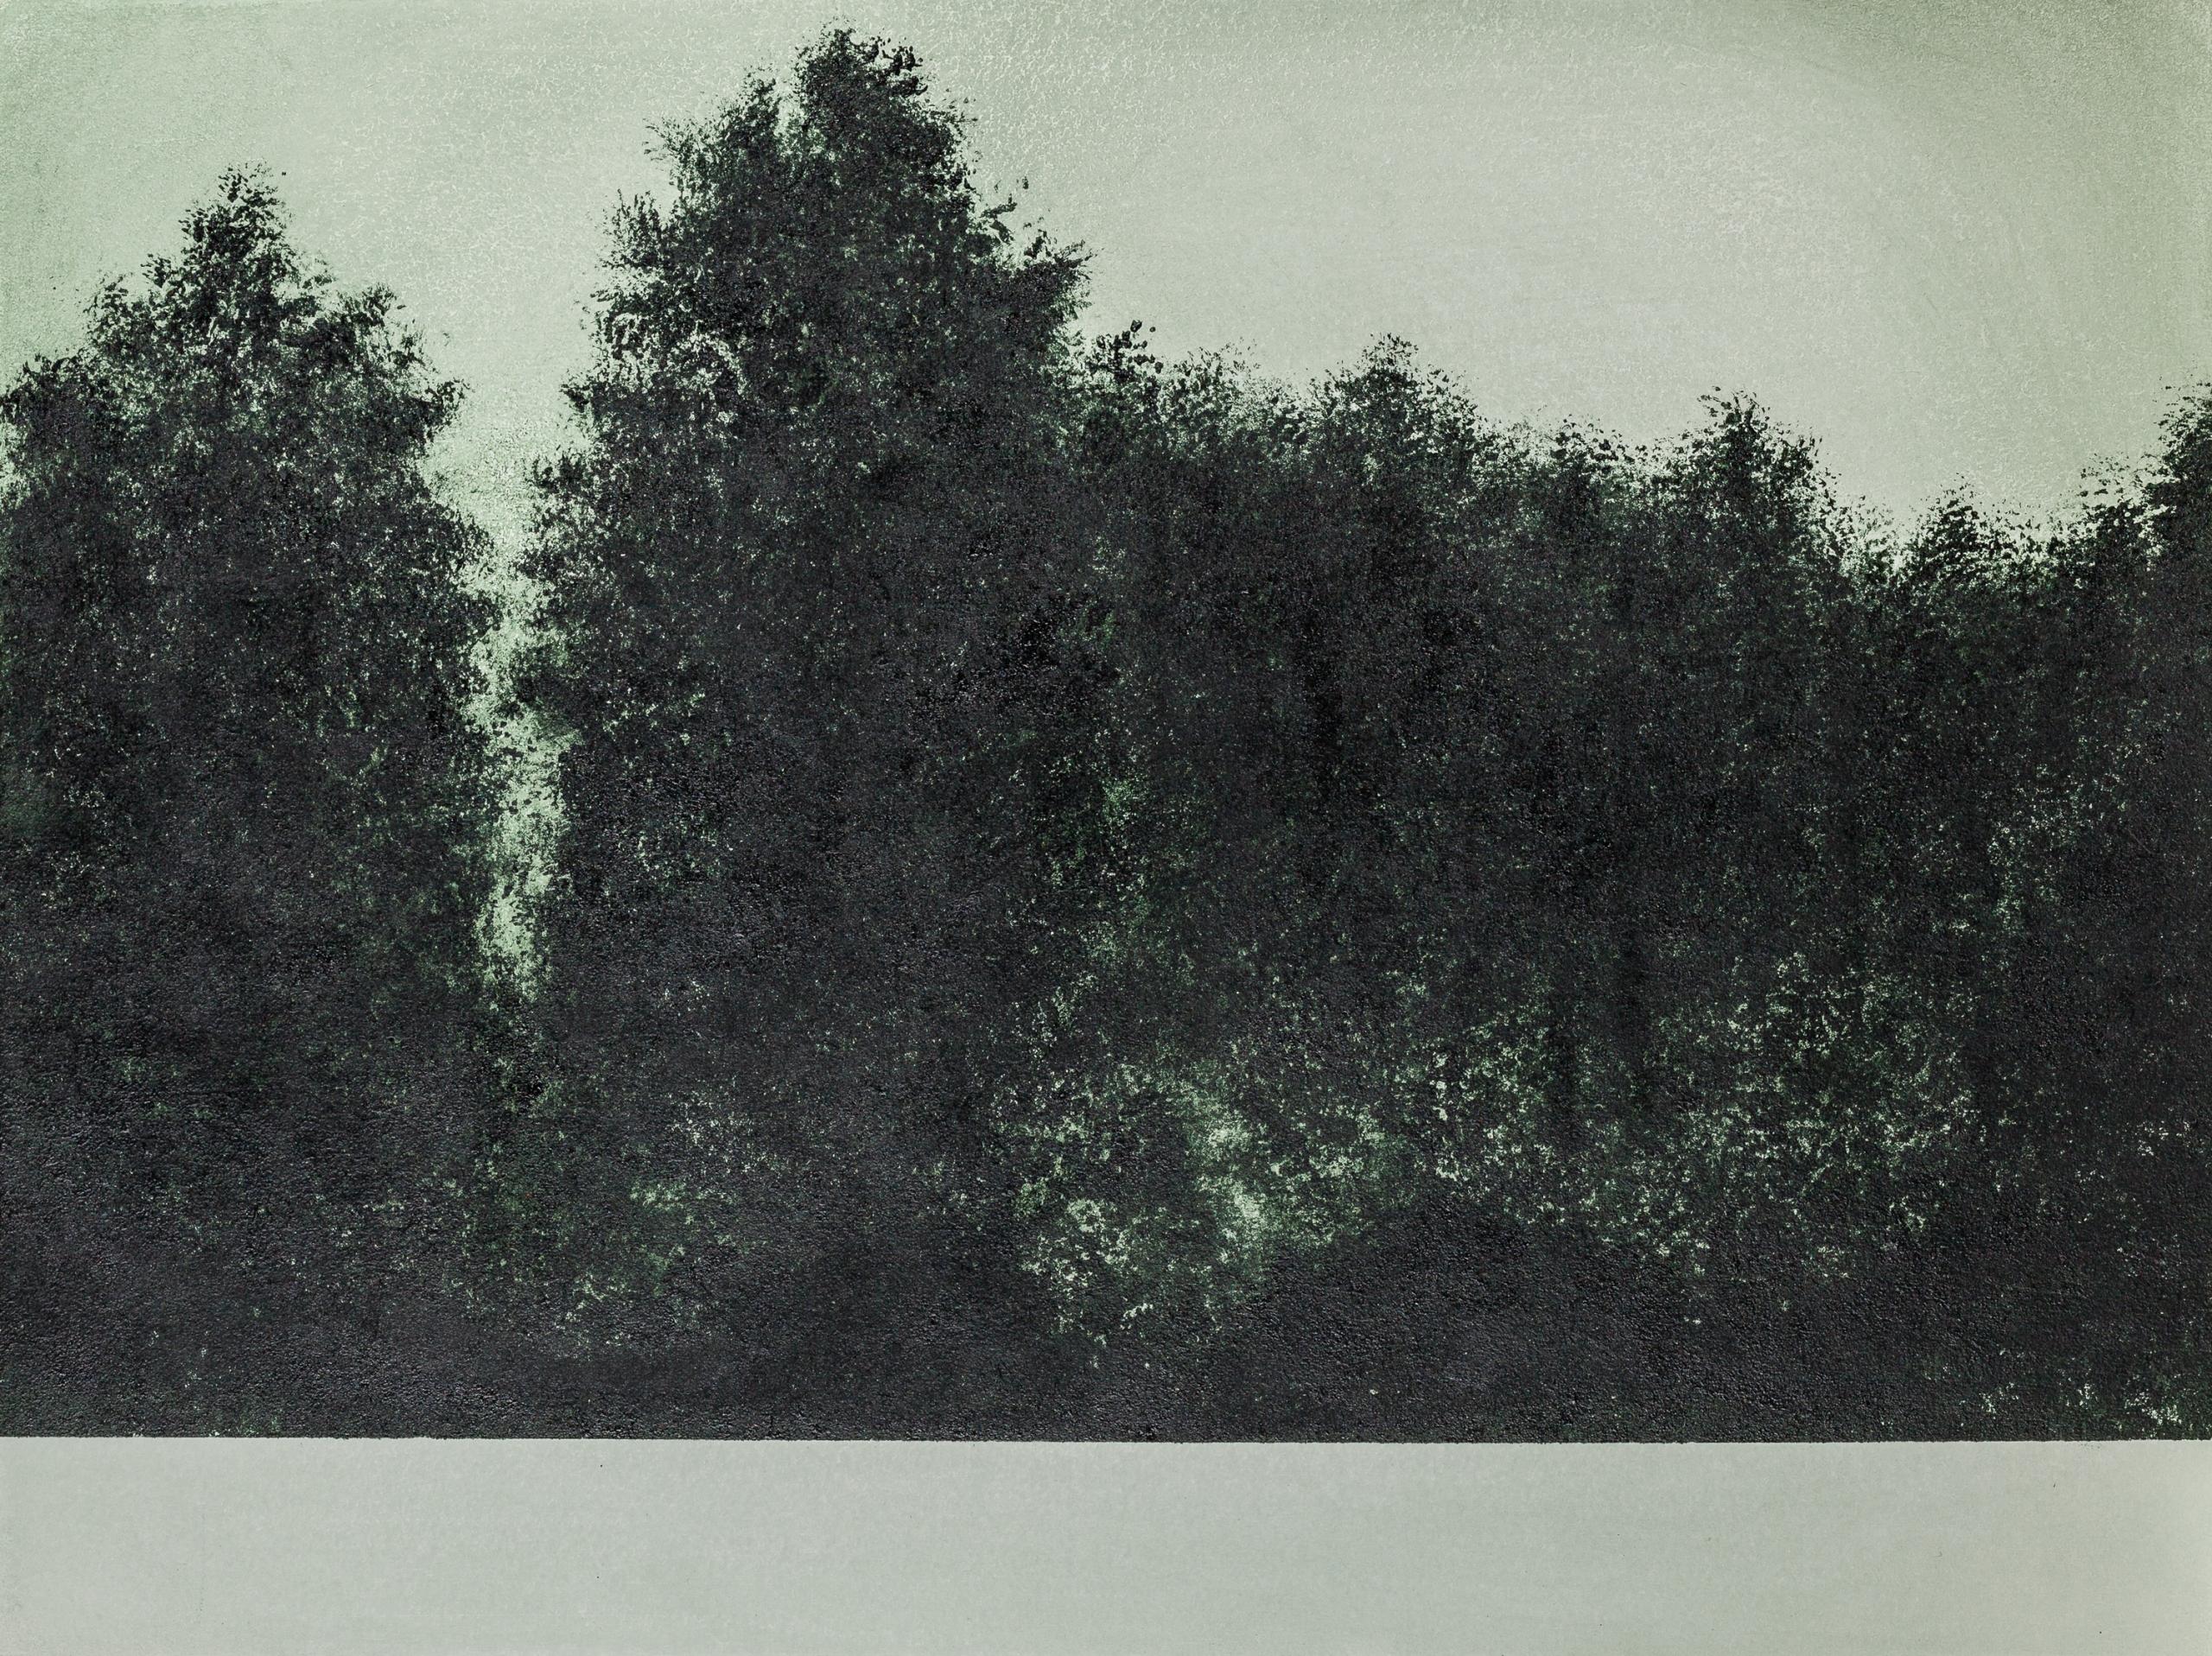 Bertram Hasenauer, Talus 12